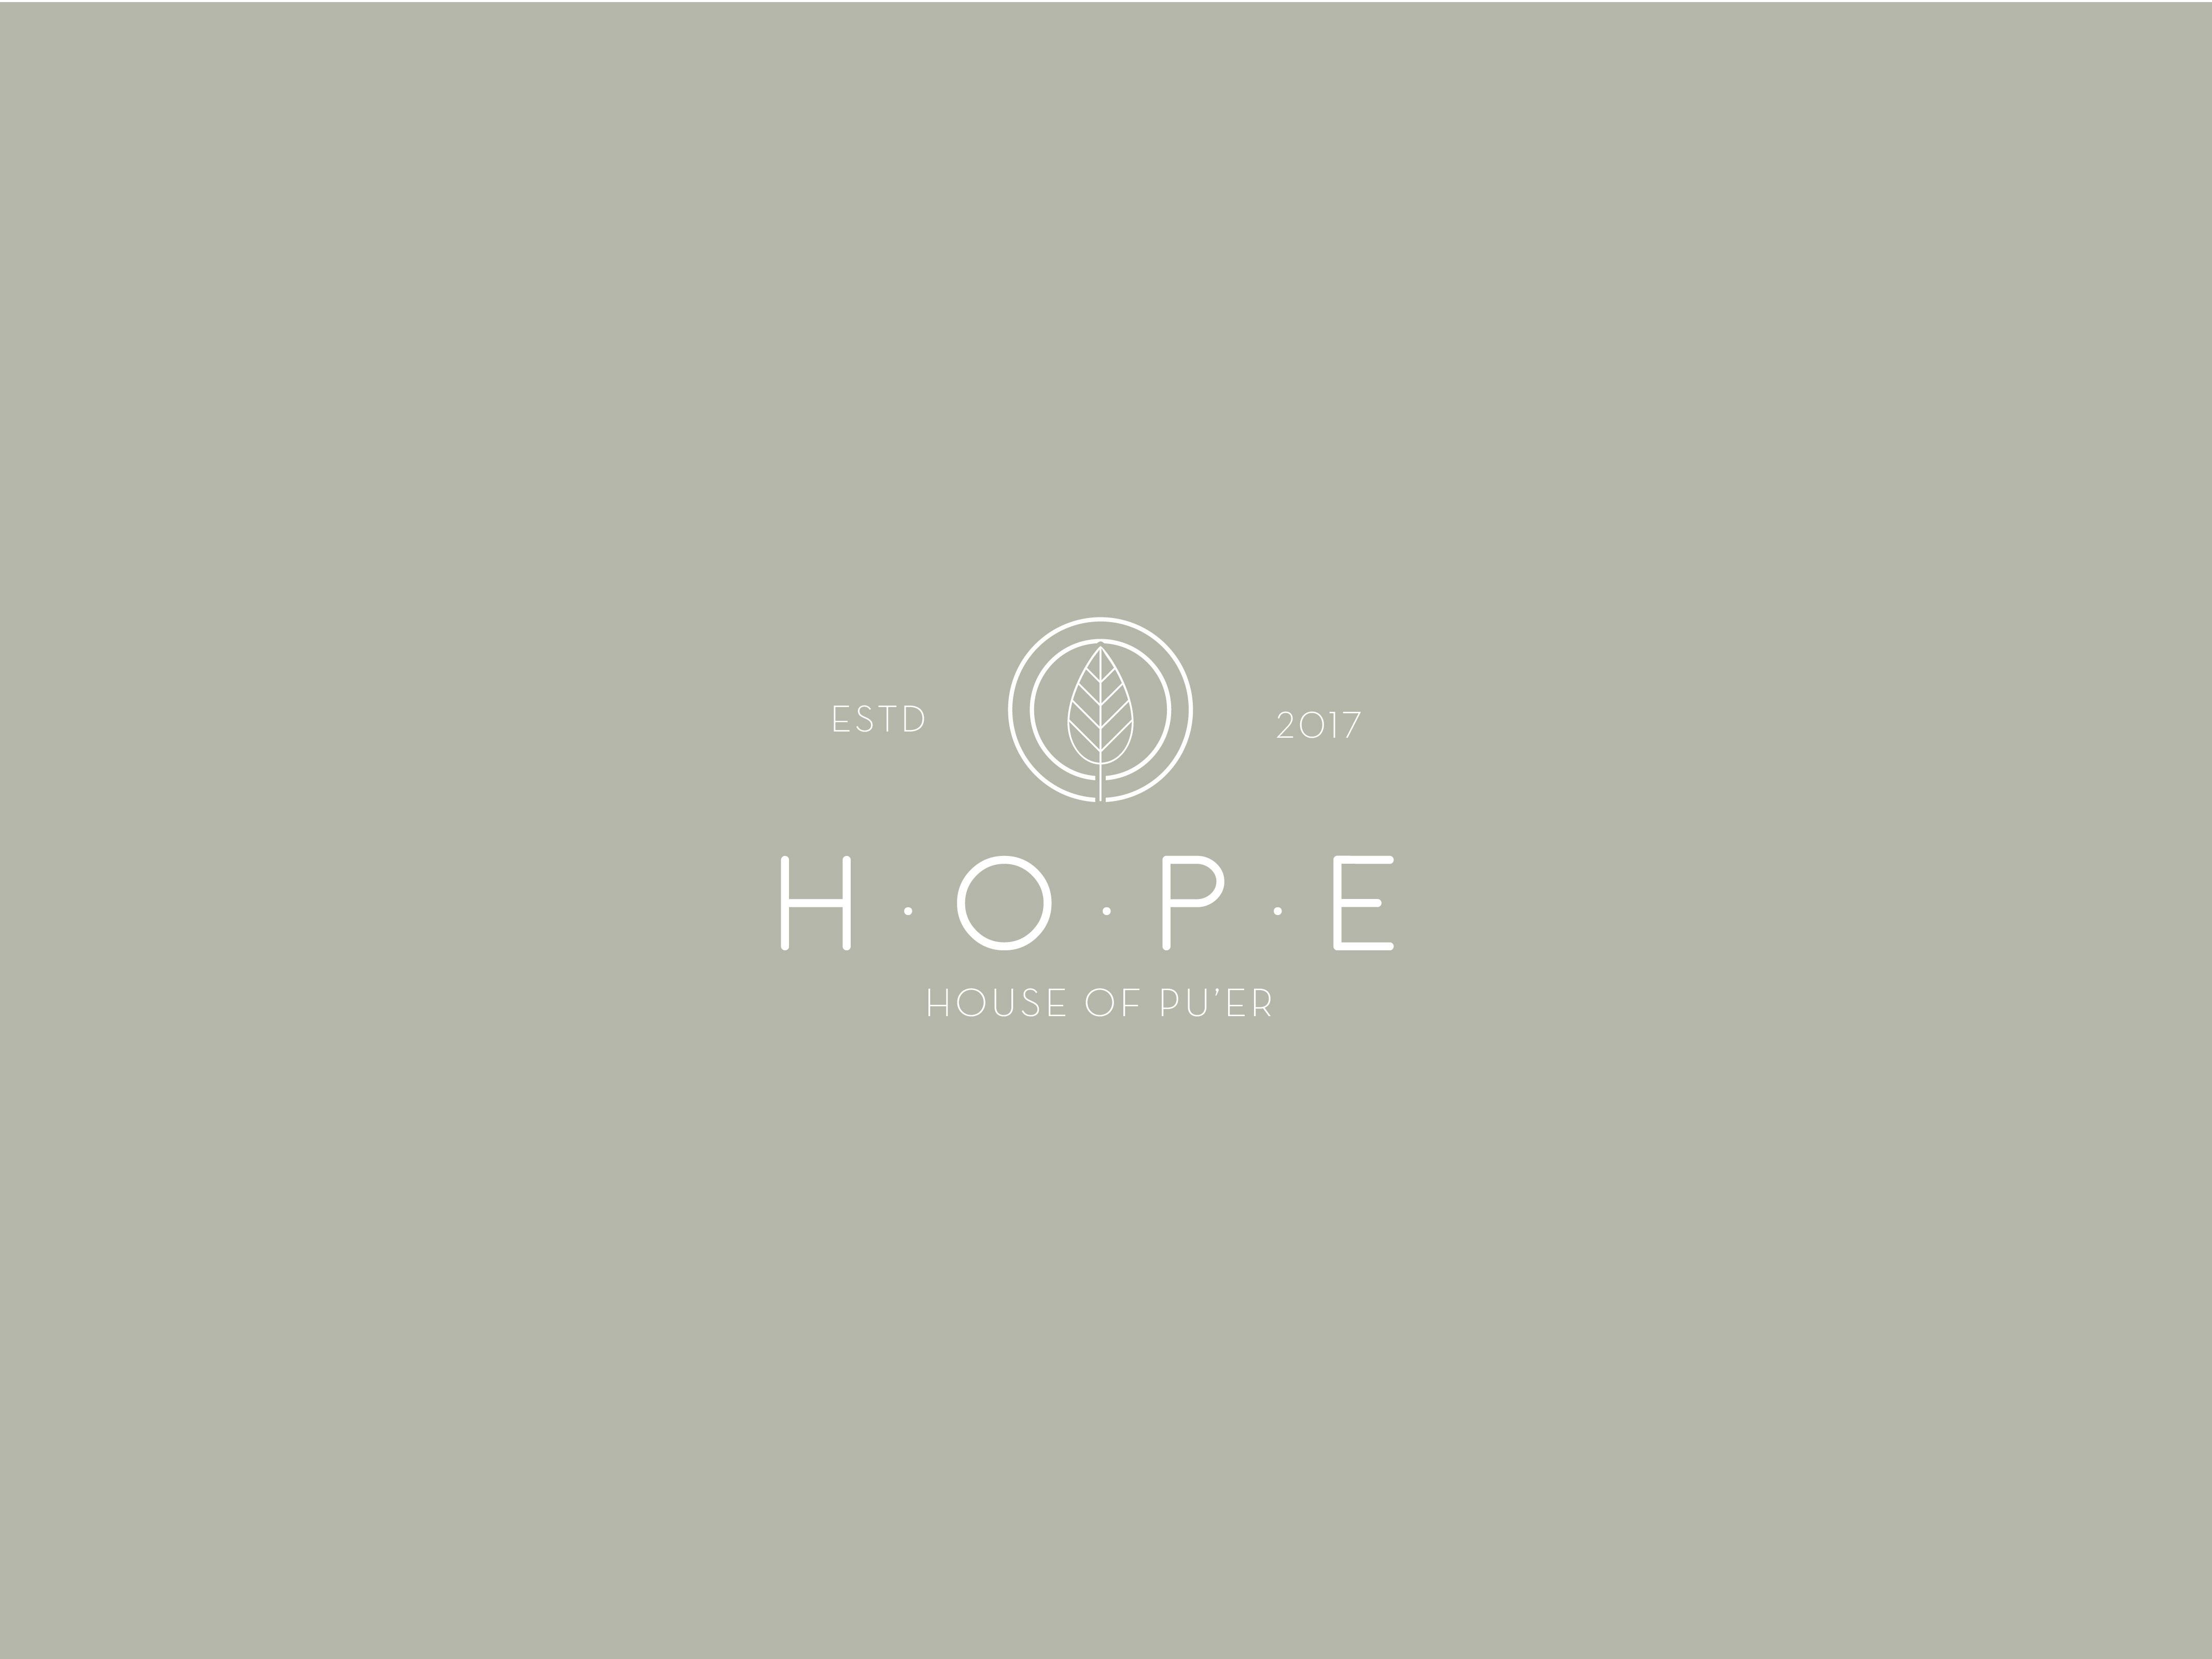 mariebabeau-graphiste-photographe-independante-freelance-strasbourg-creation de logo-identite-marque de the-HOPE.-3jpg